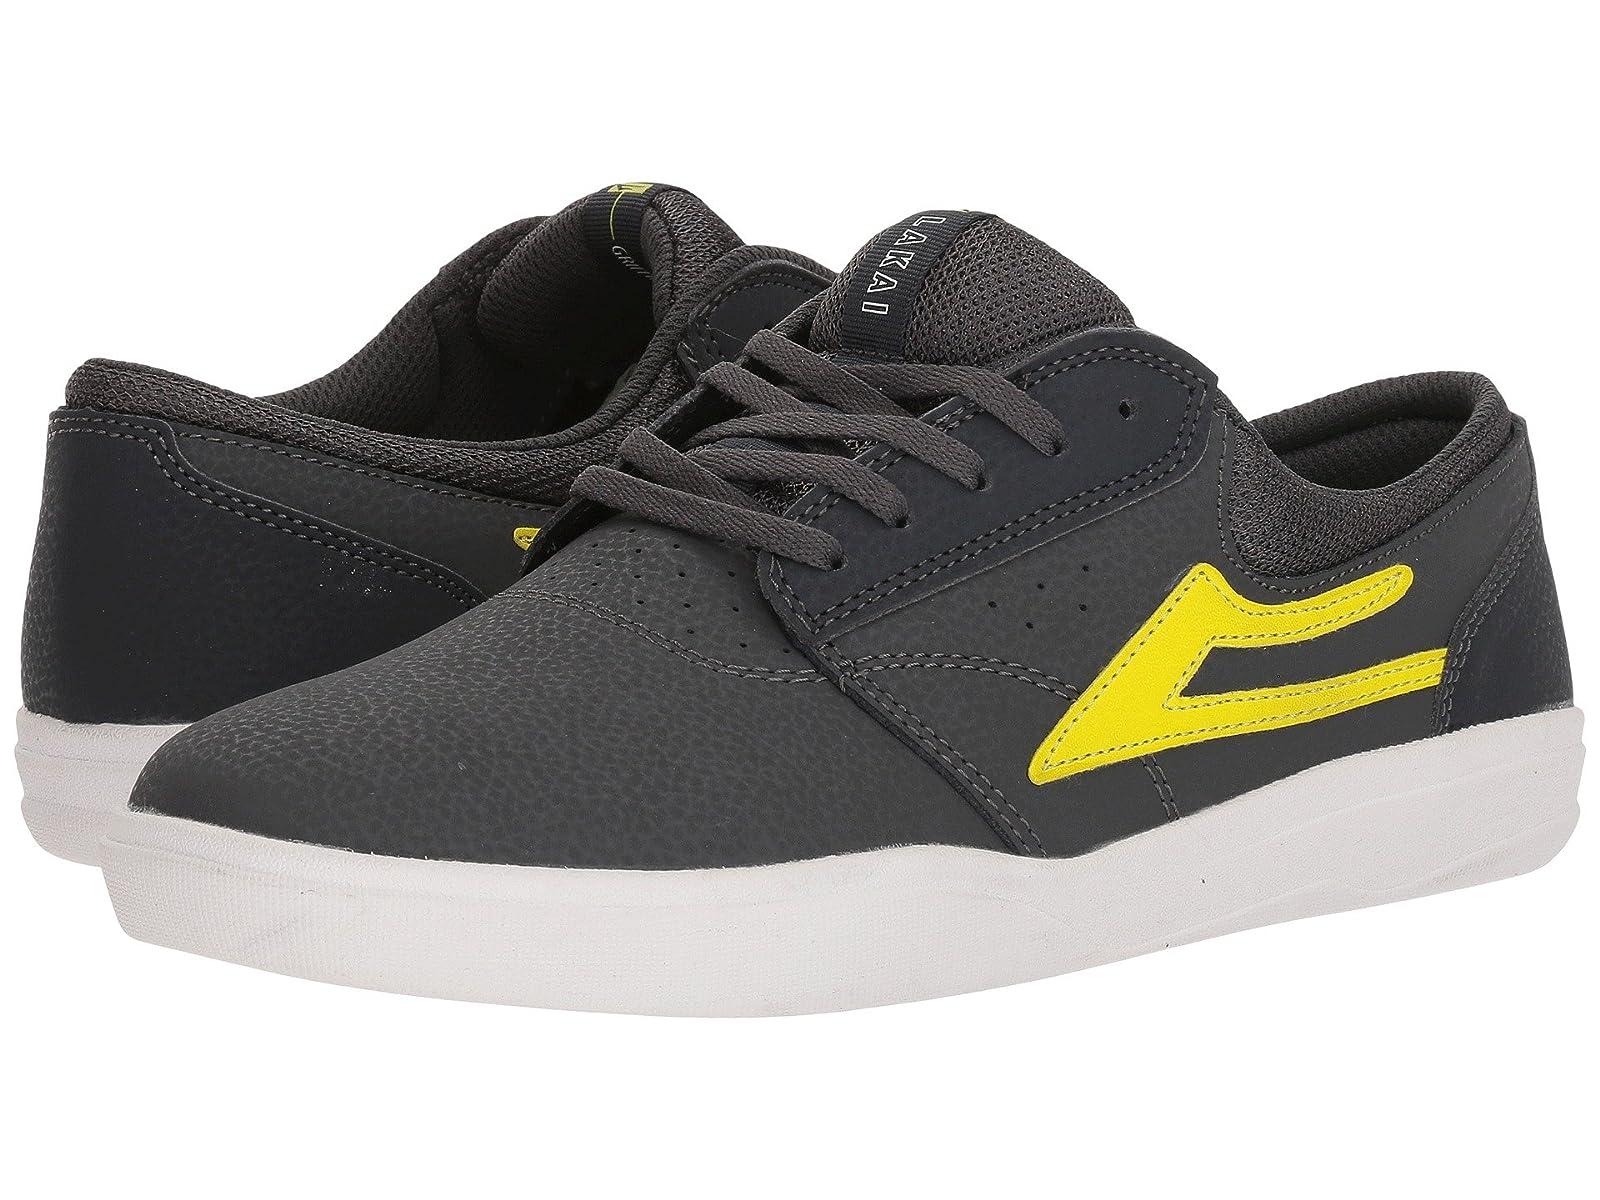 Lakai Griffin XLKCheap and distinctive eye-catching shoes